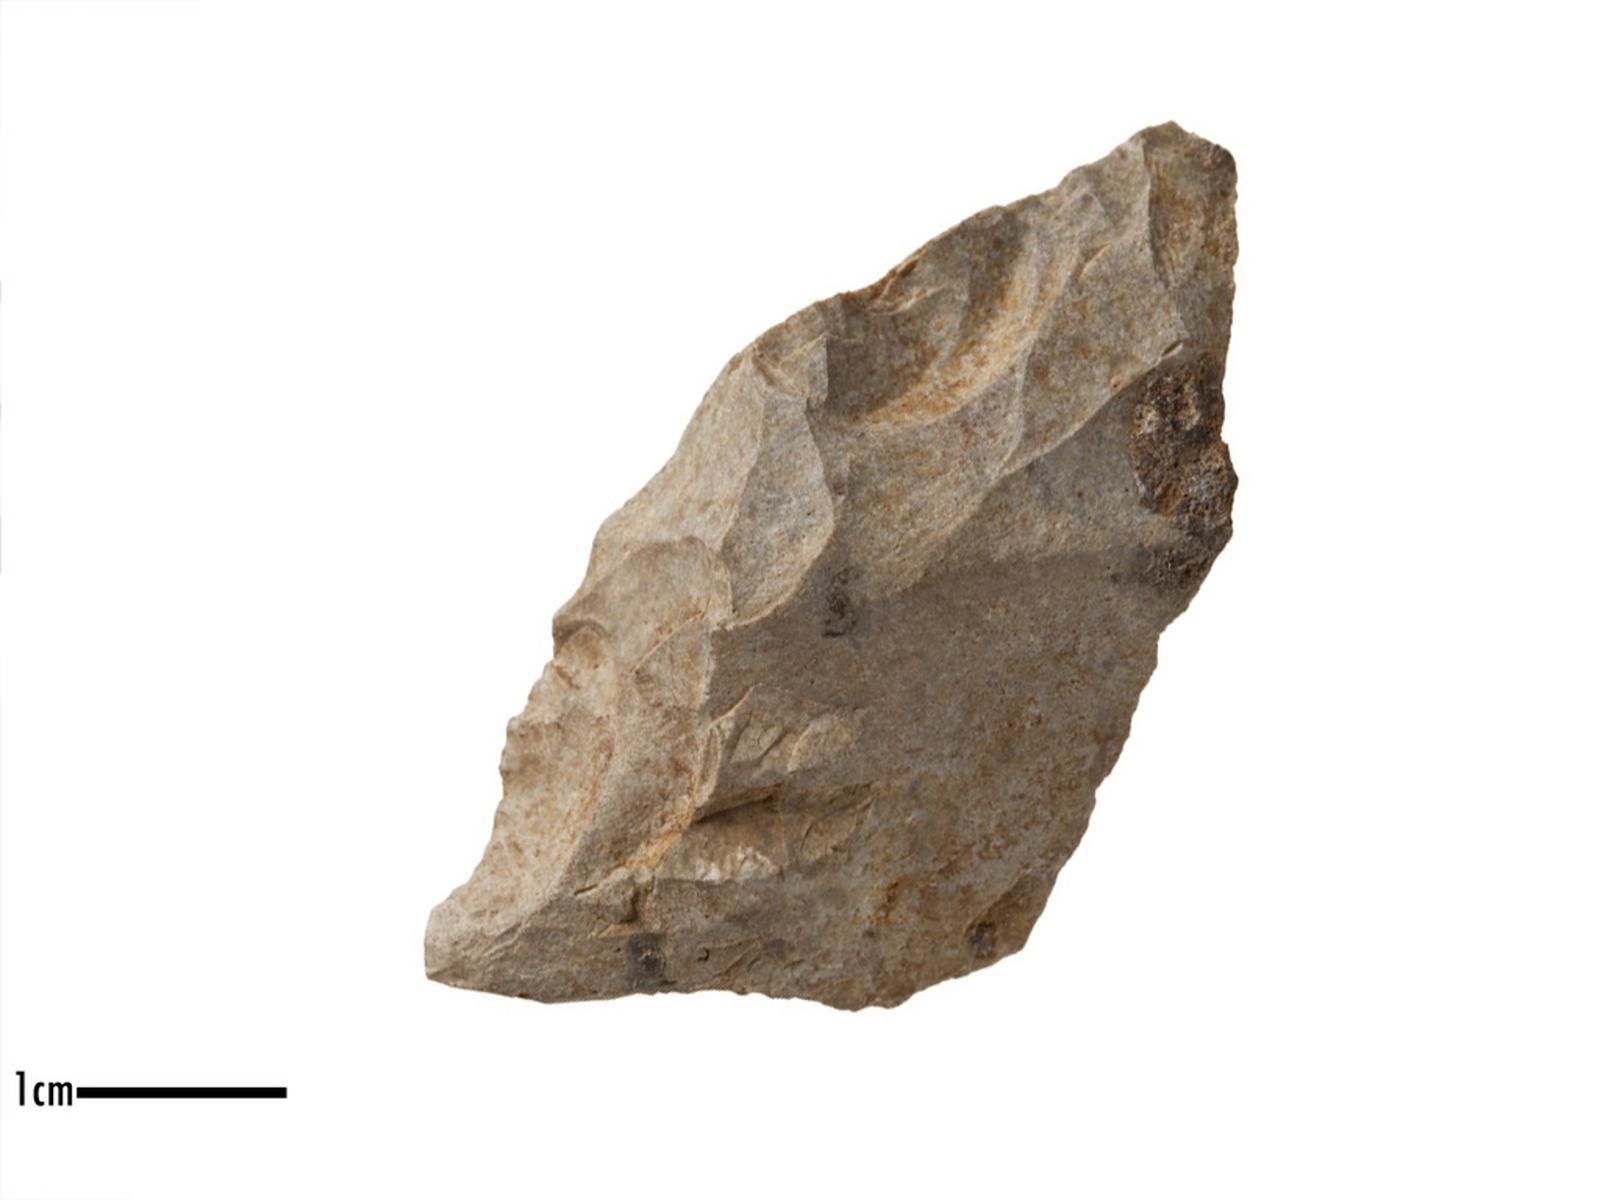 Racloir (transversal)_0